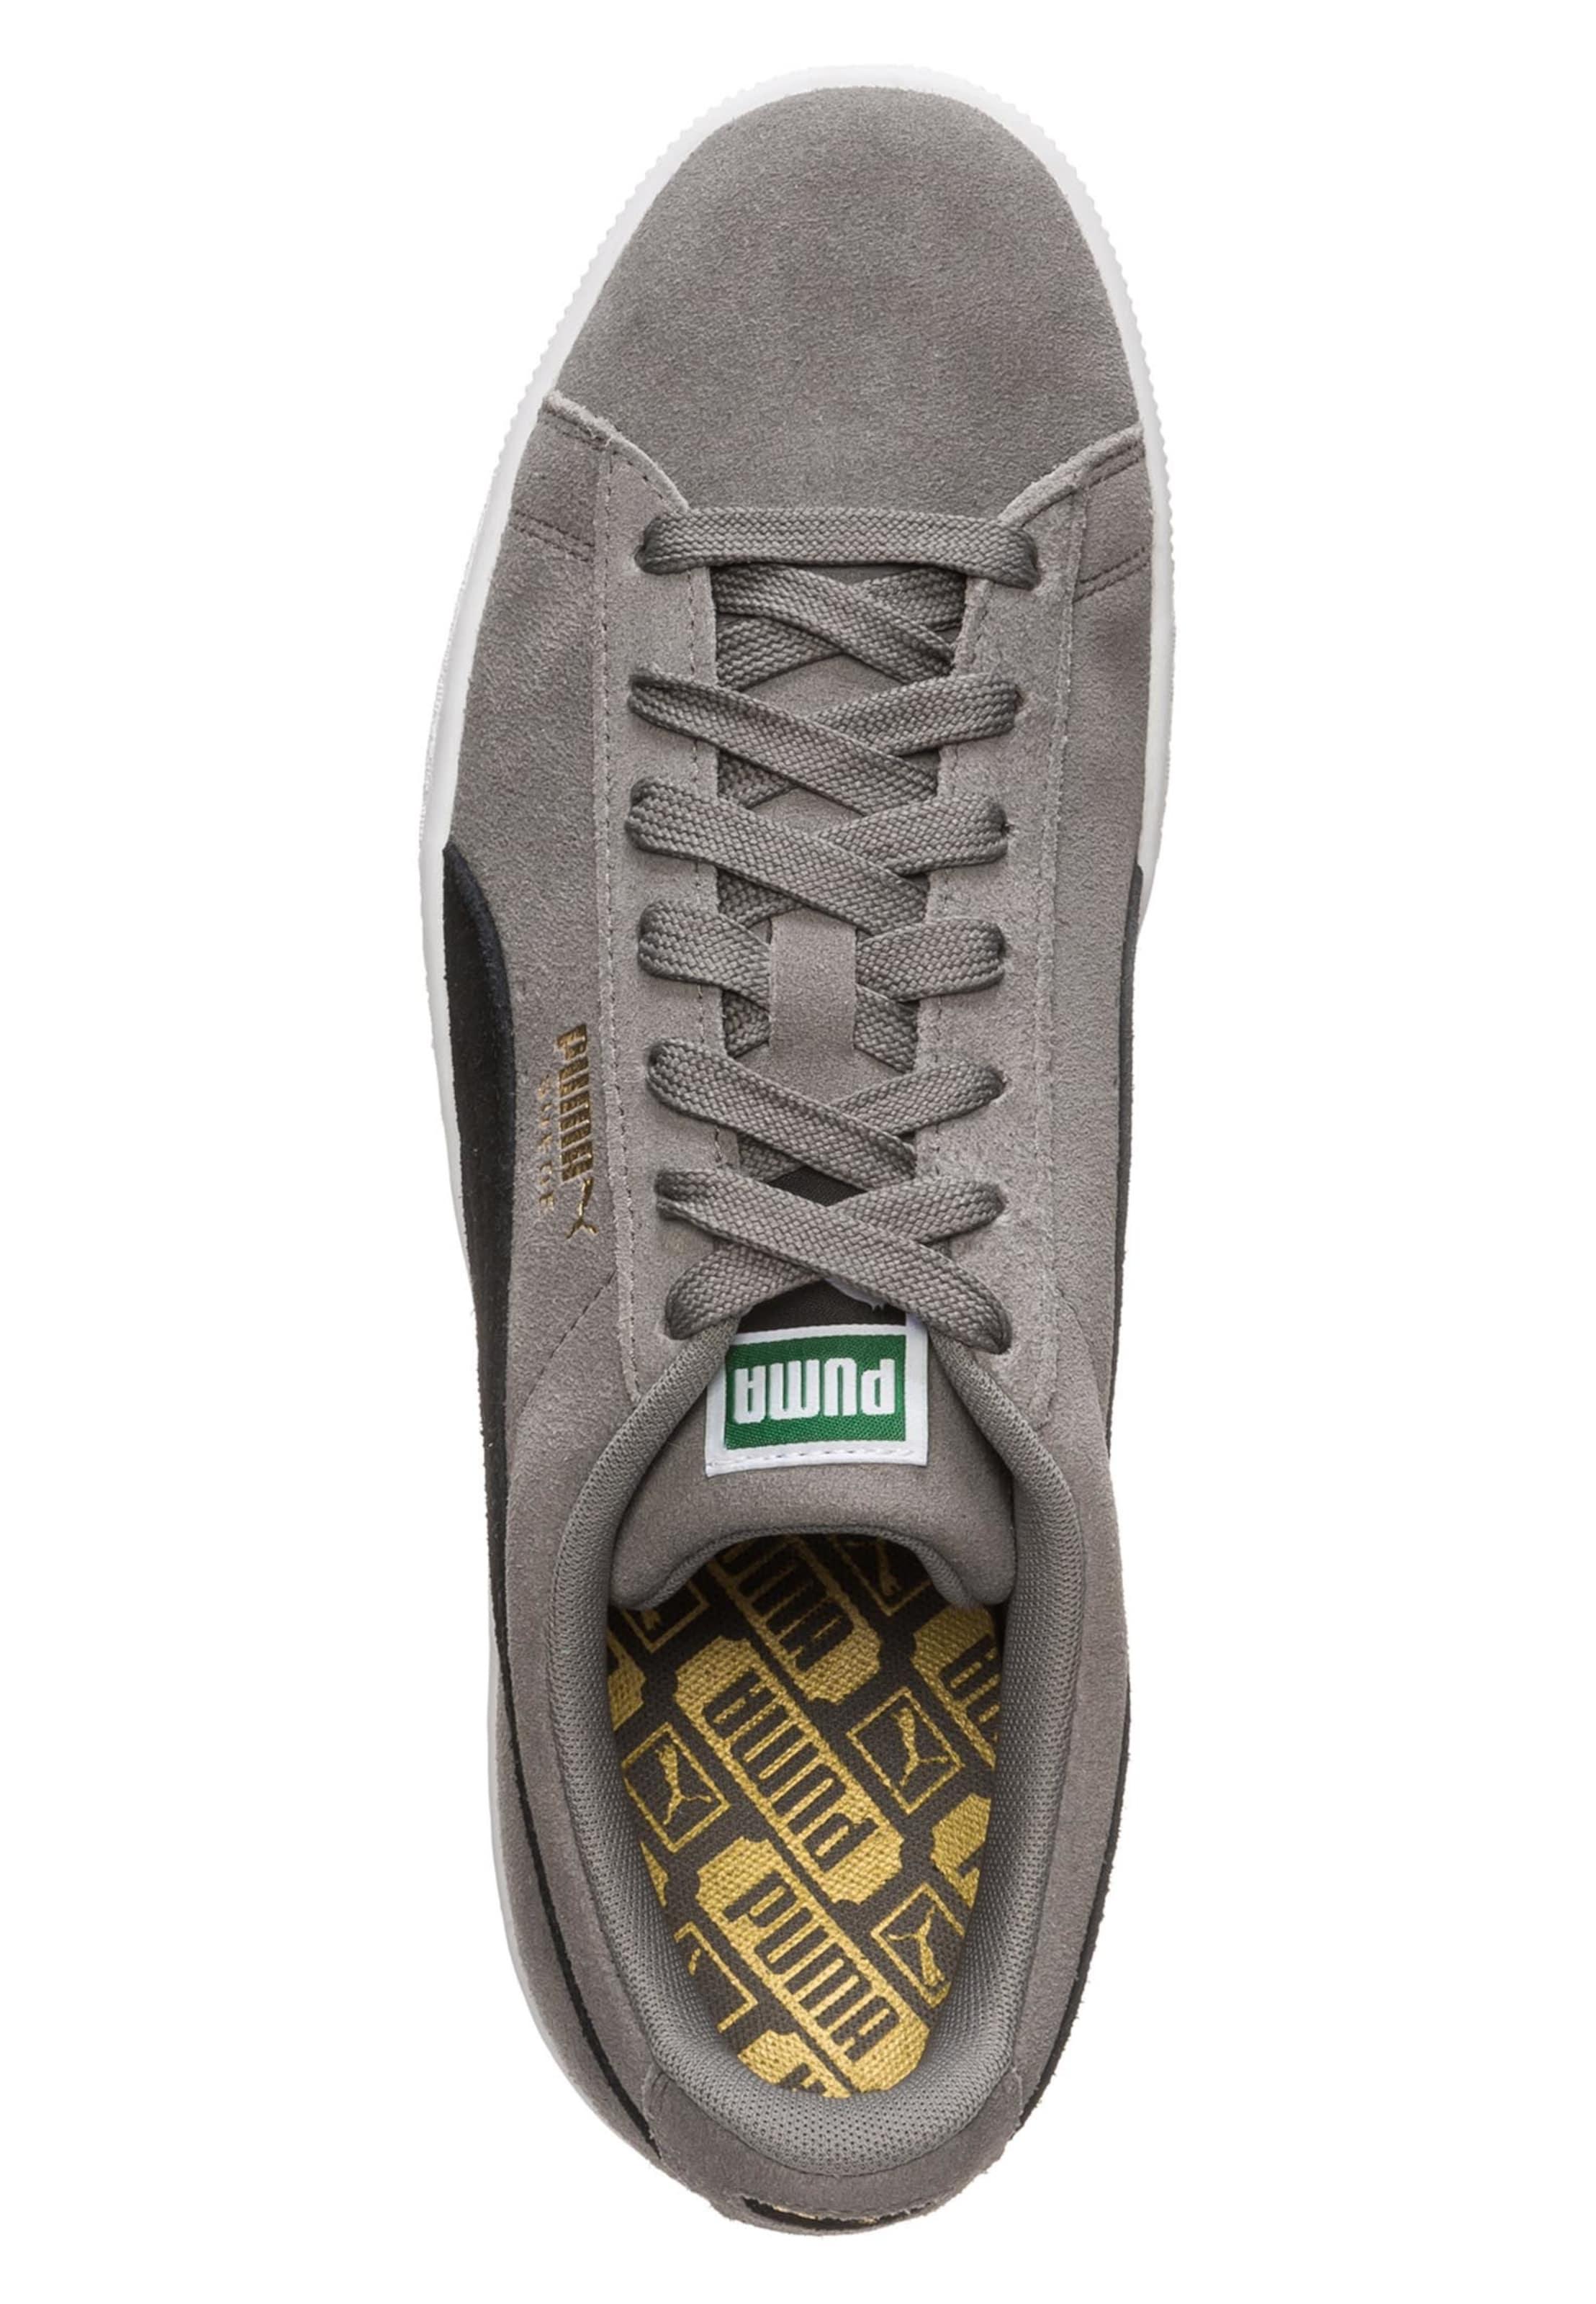 Classic' 'suede Puma Sneaker In RauchgrauSchwarz rxBoeWdC